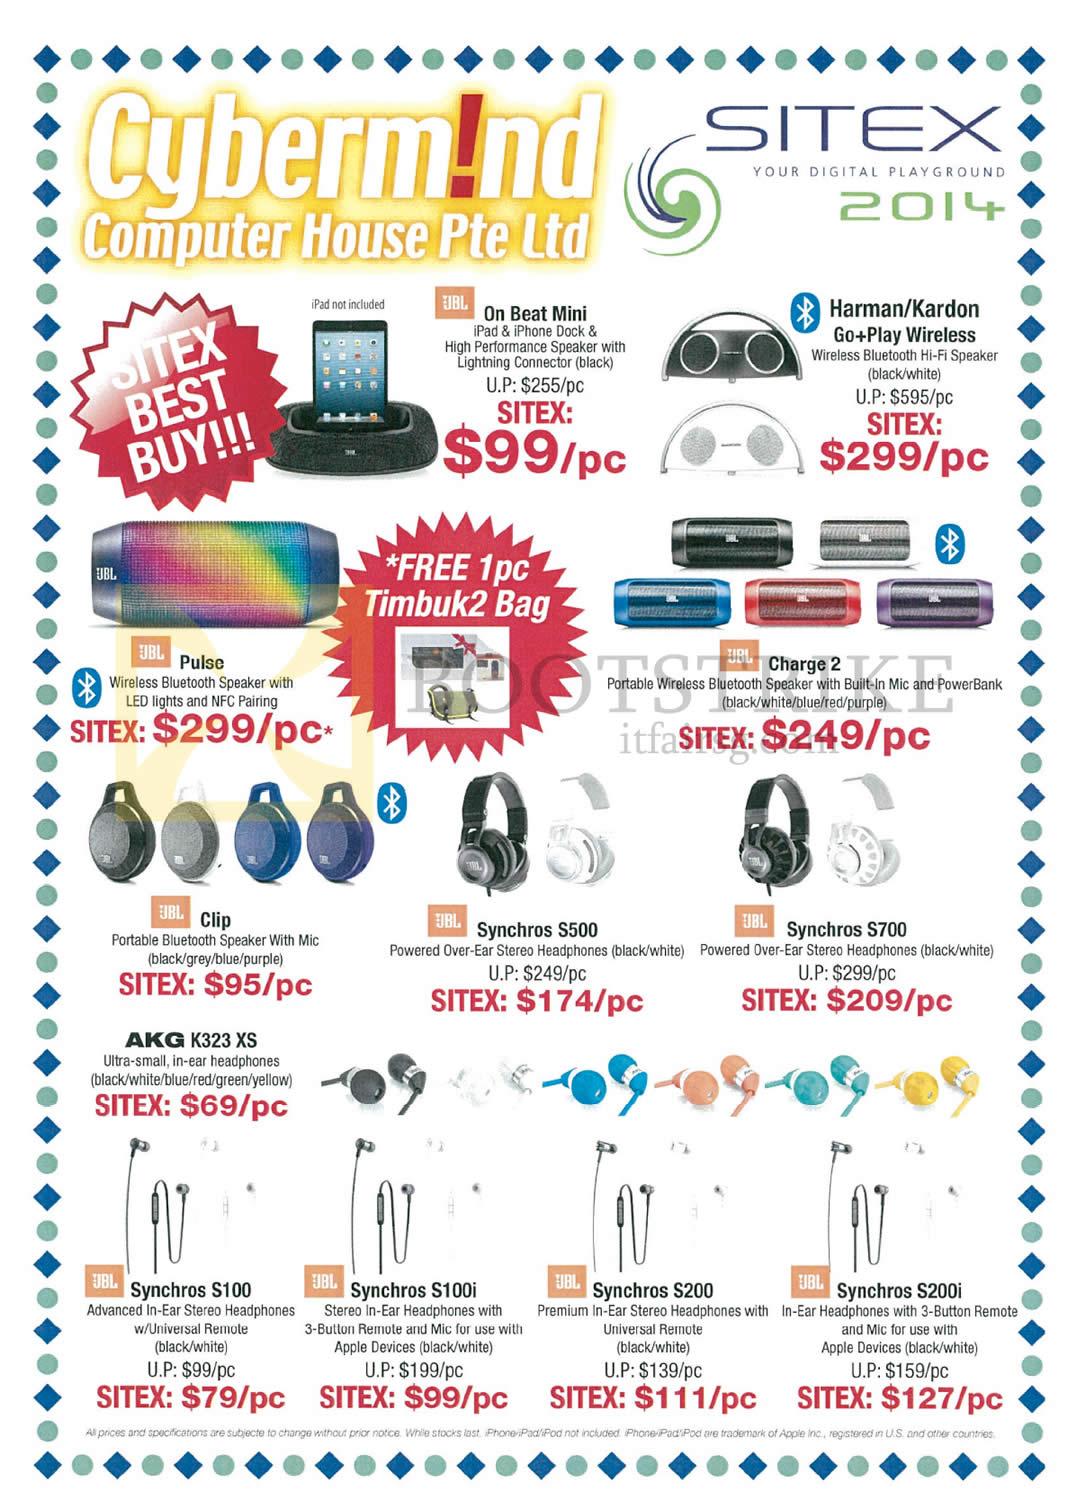 SITEX 2014 price list image brochure of Cybermind Audio JBL, Harman Kardon, On Beat Mini, Pulse Speaker, Charge 2, Clip, Synchros